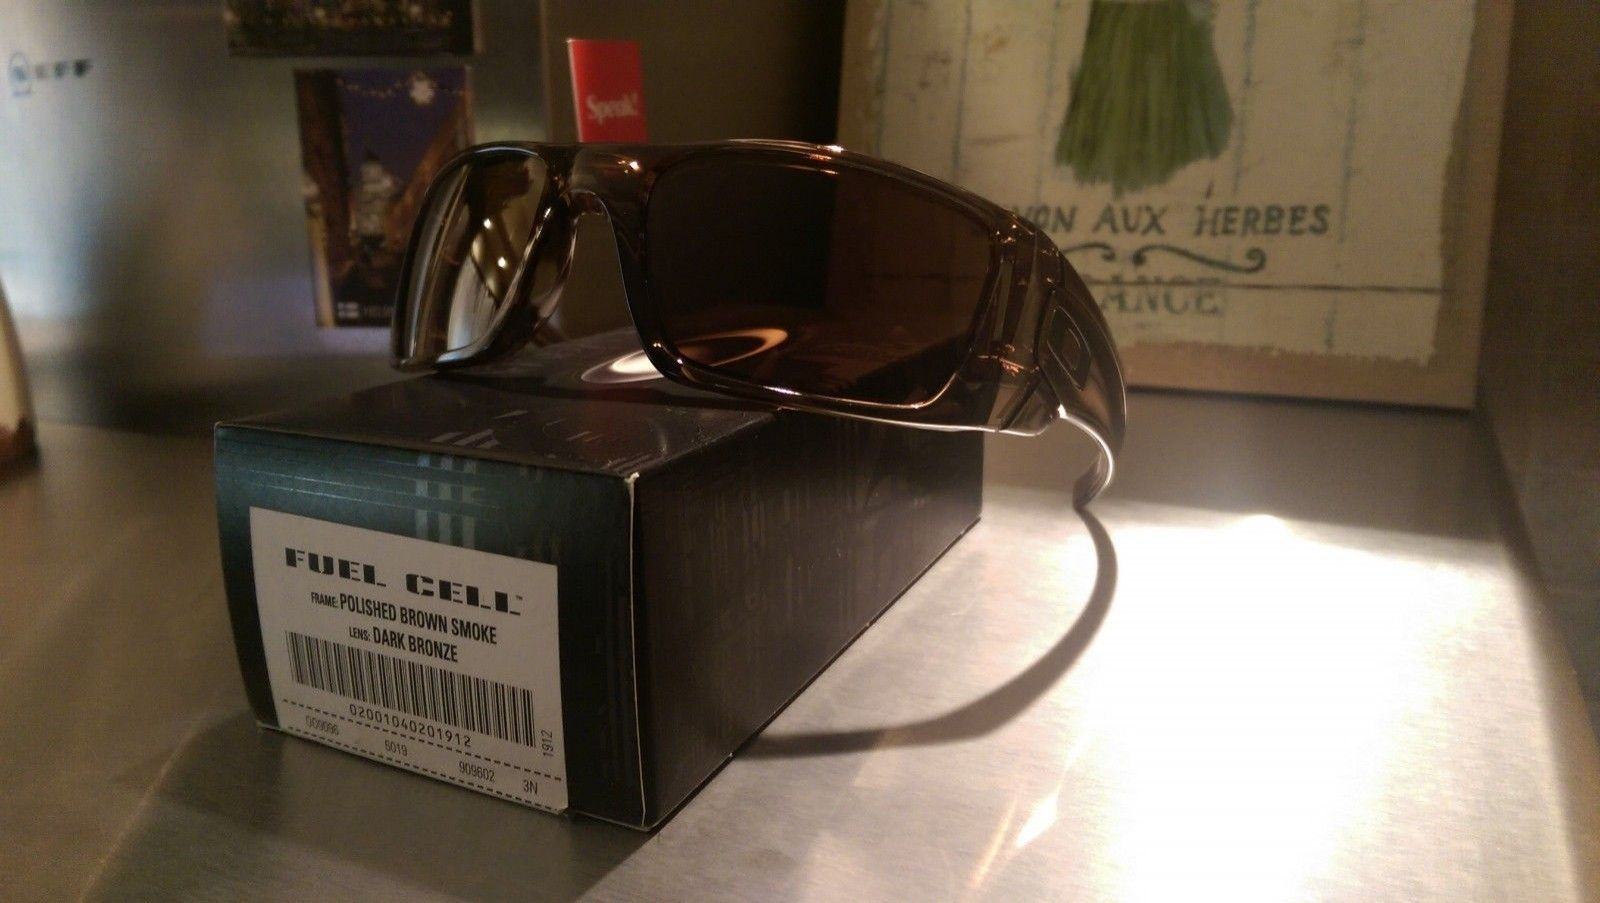 Fuel Cell Brown smoke/dark bronze BNIB - wefqwfqwf.jpg